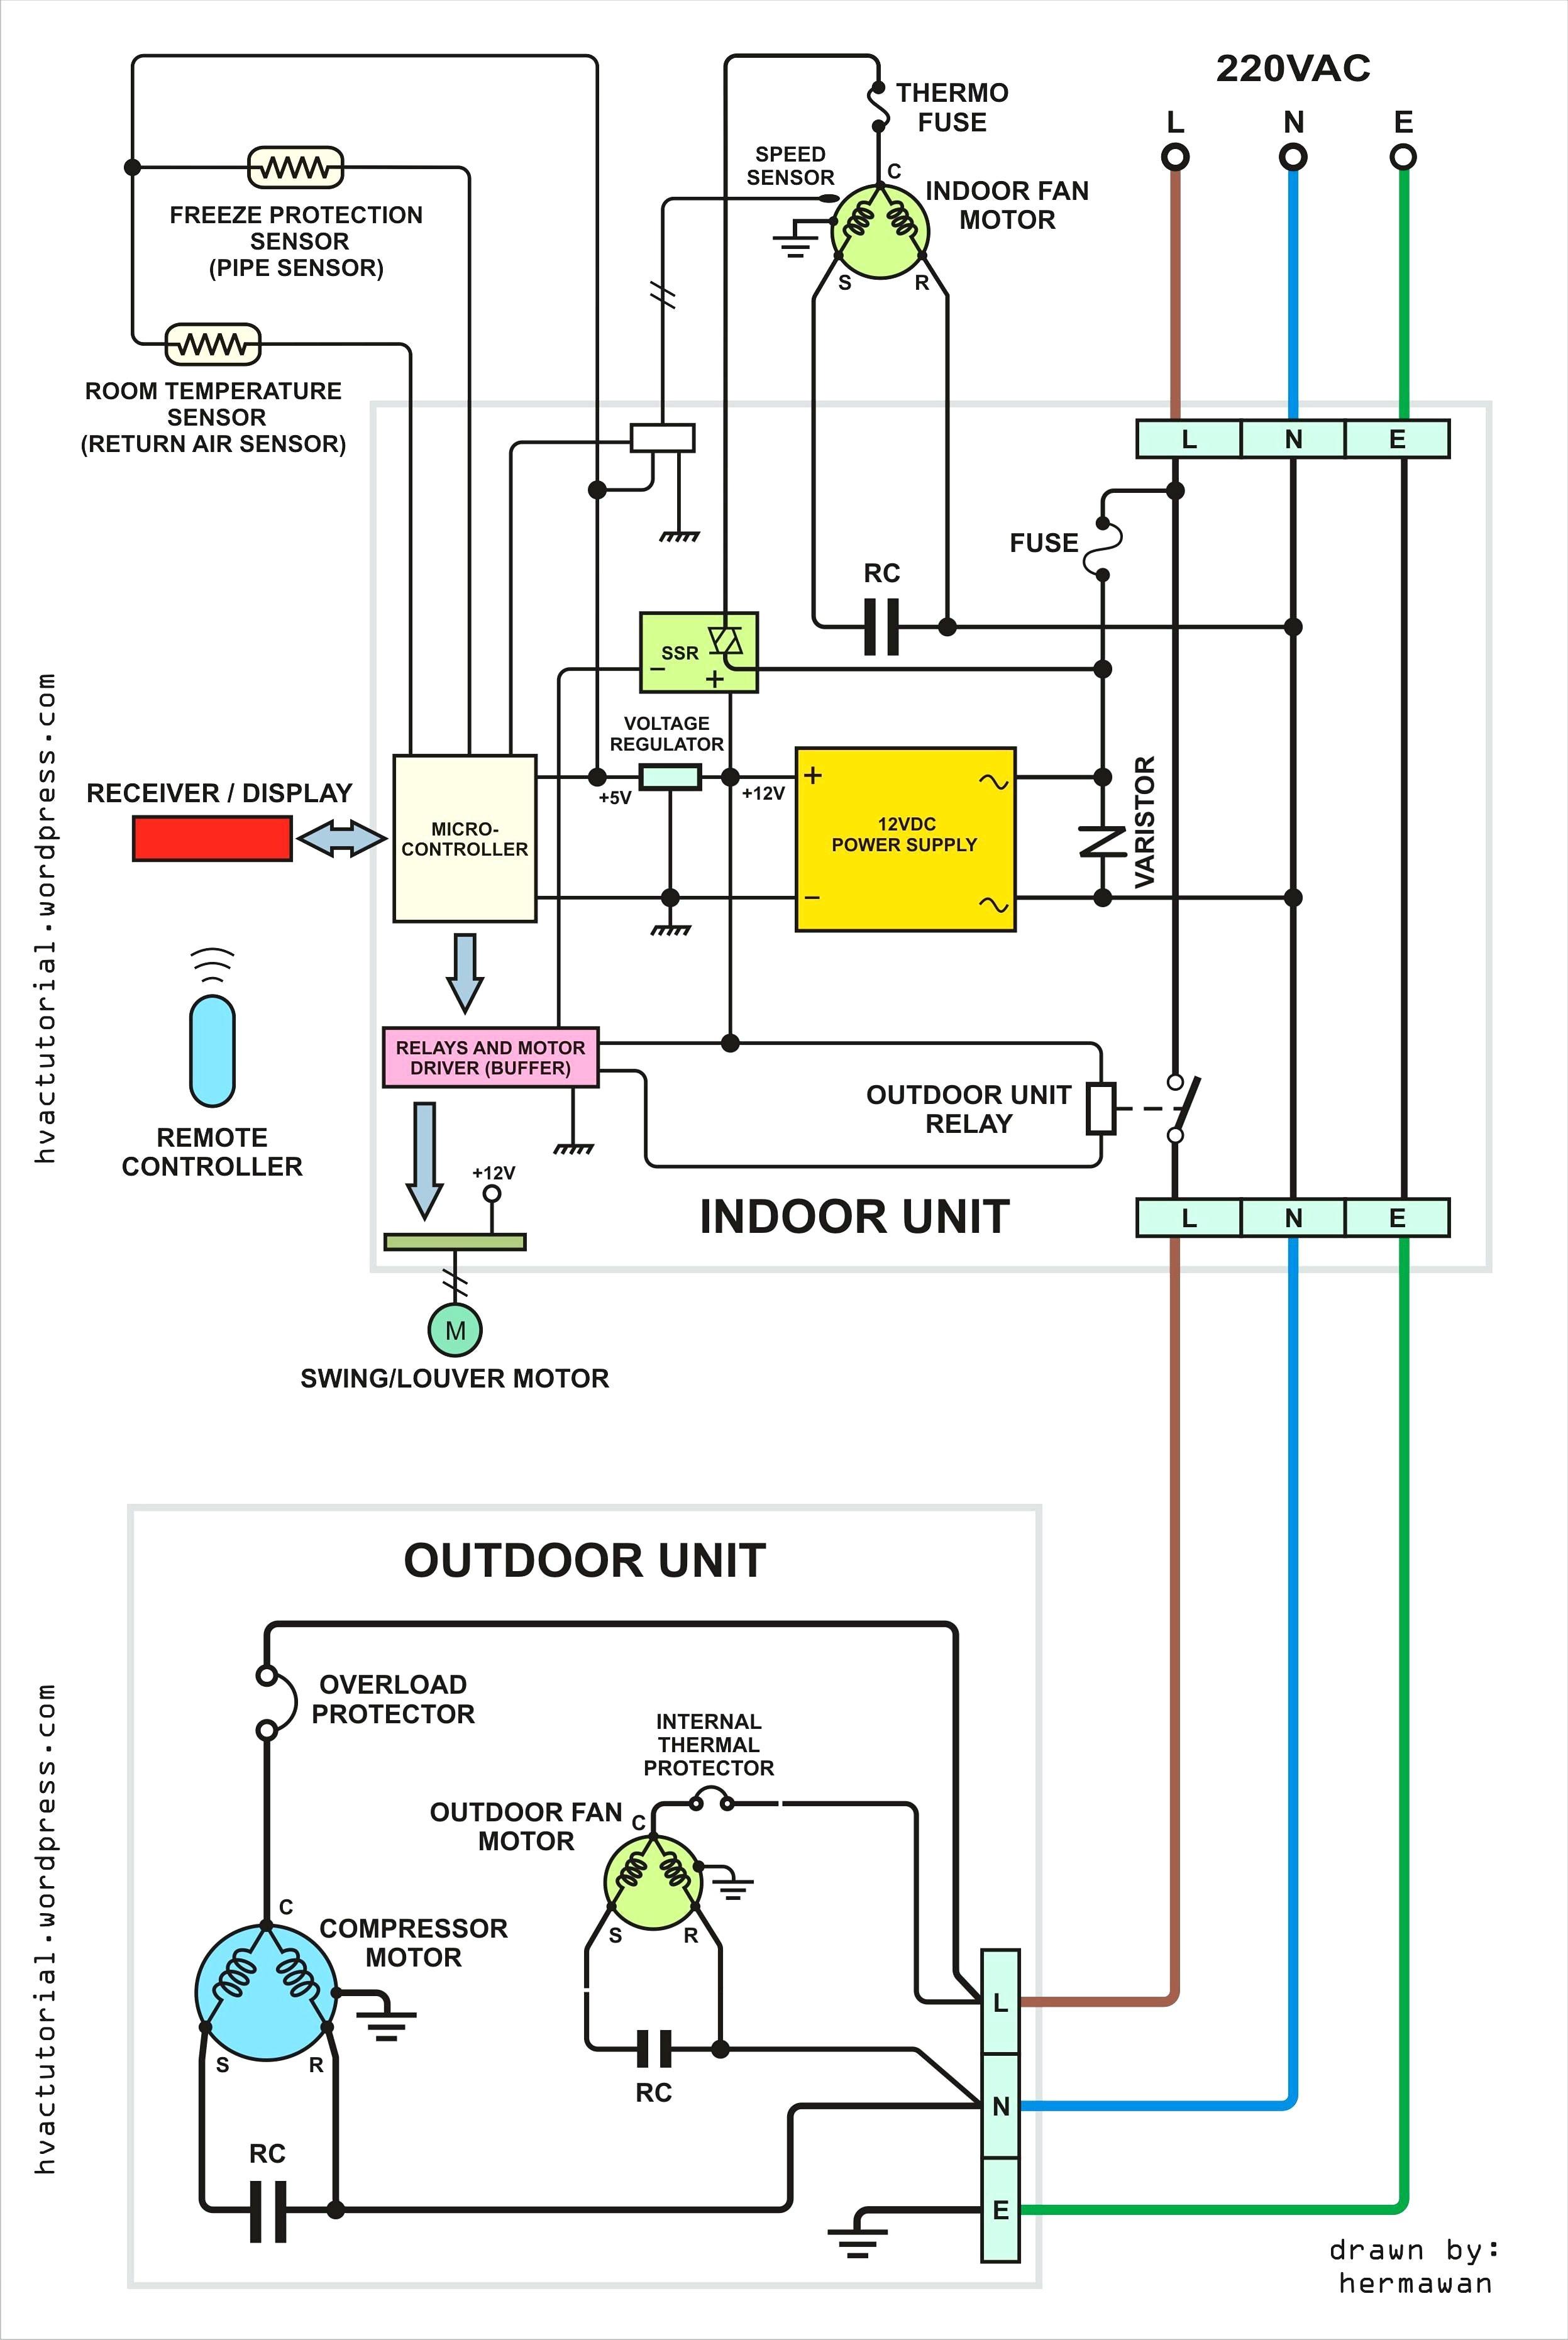 honeywell r8285d5001 wiring diagram relay explore wiring diagramr845 honeywell switching relay wiring diagram wiring diagram pass rib relay wiring diagram honeywell r8285d5001 wiring diagram relay